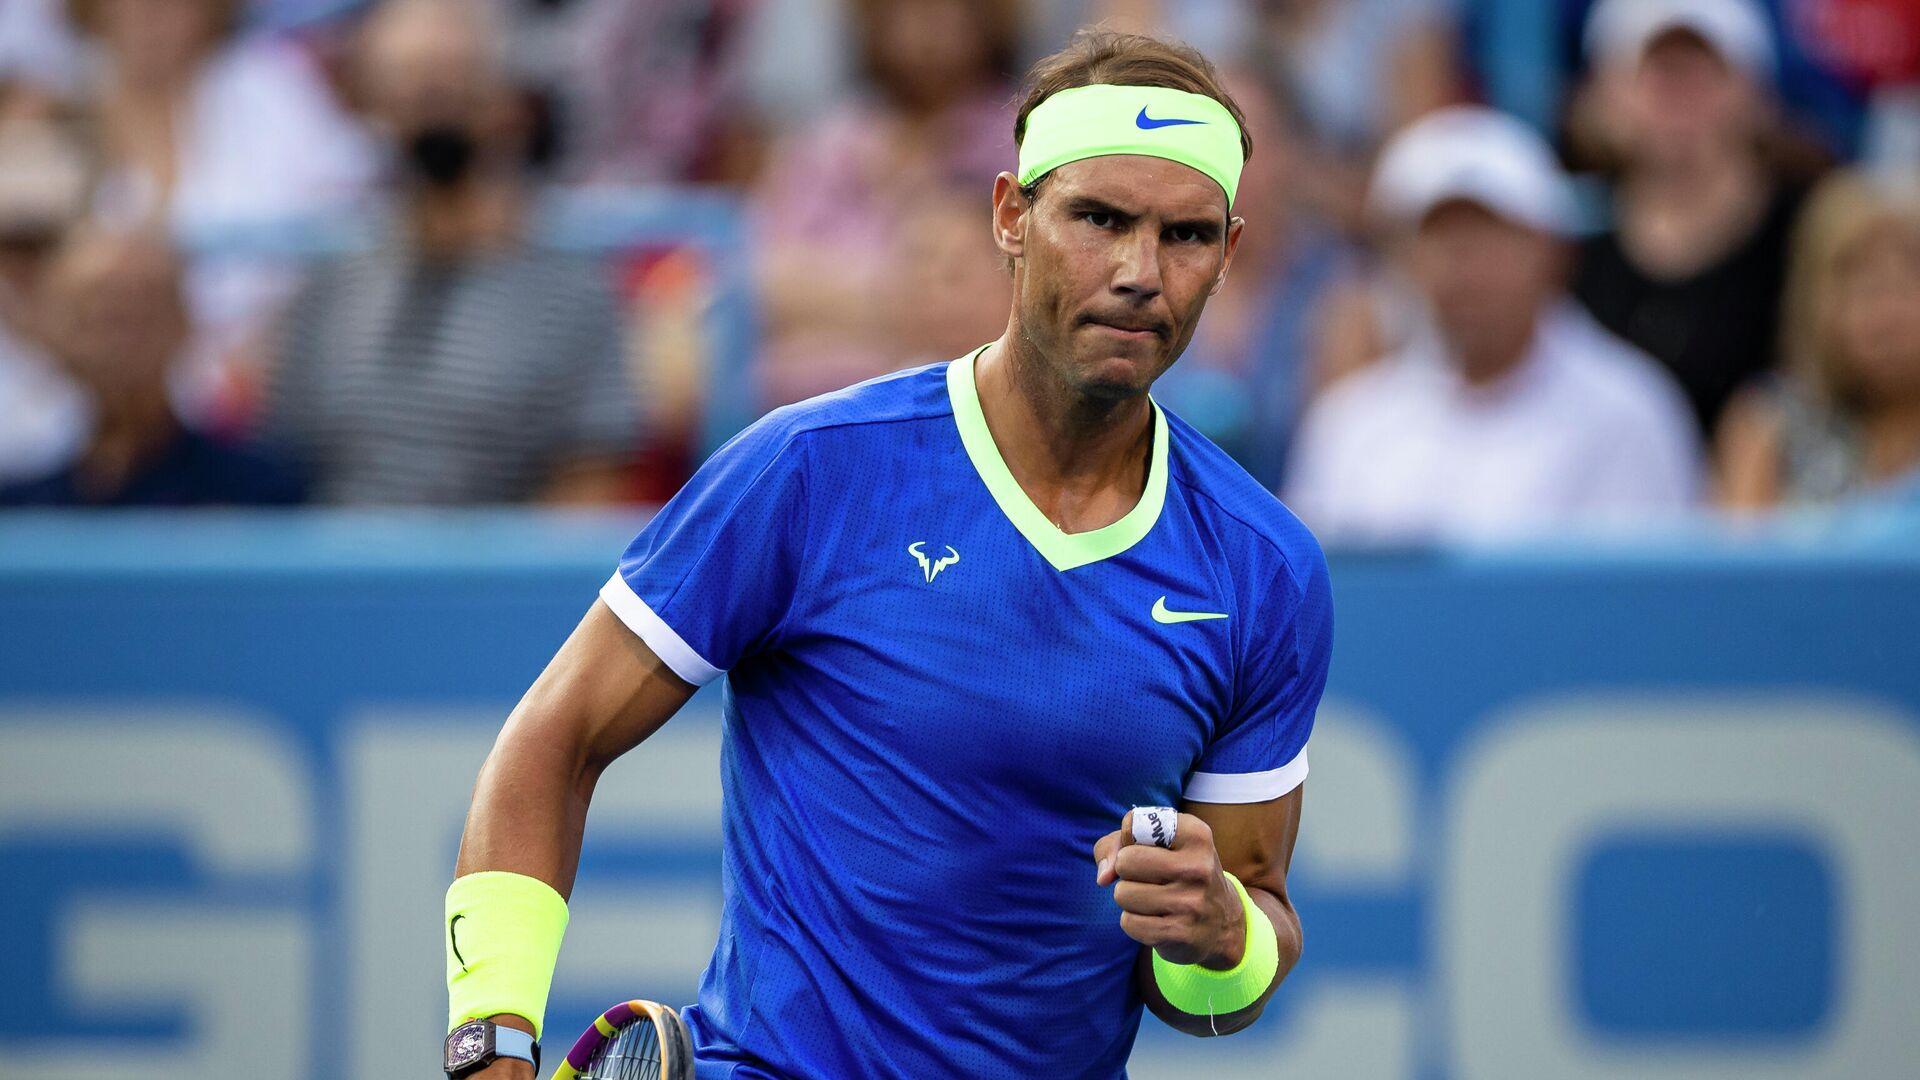 Rafael Nadal, tenista español - Sputnik Mundo, 1920, 20.08.2021